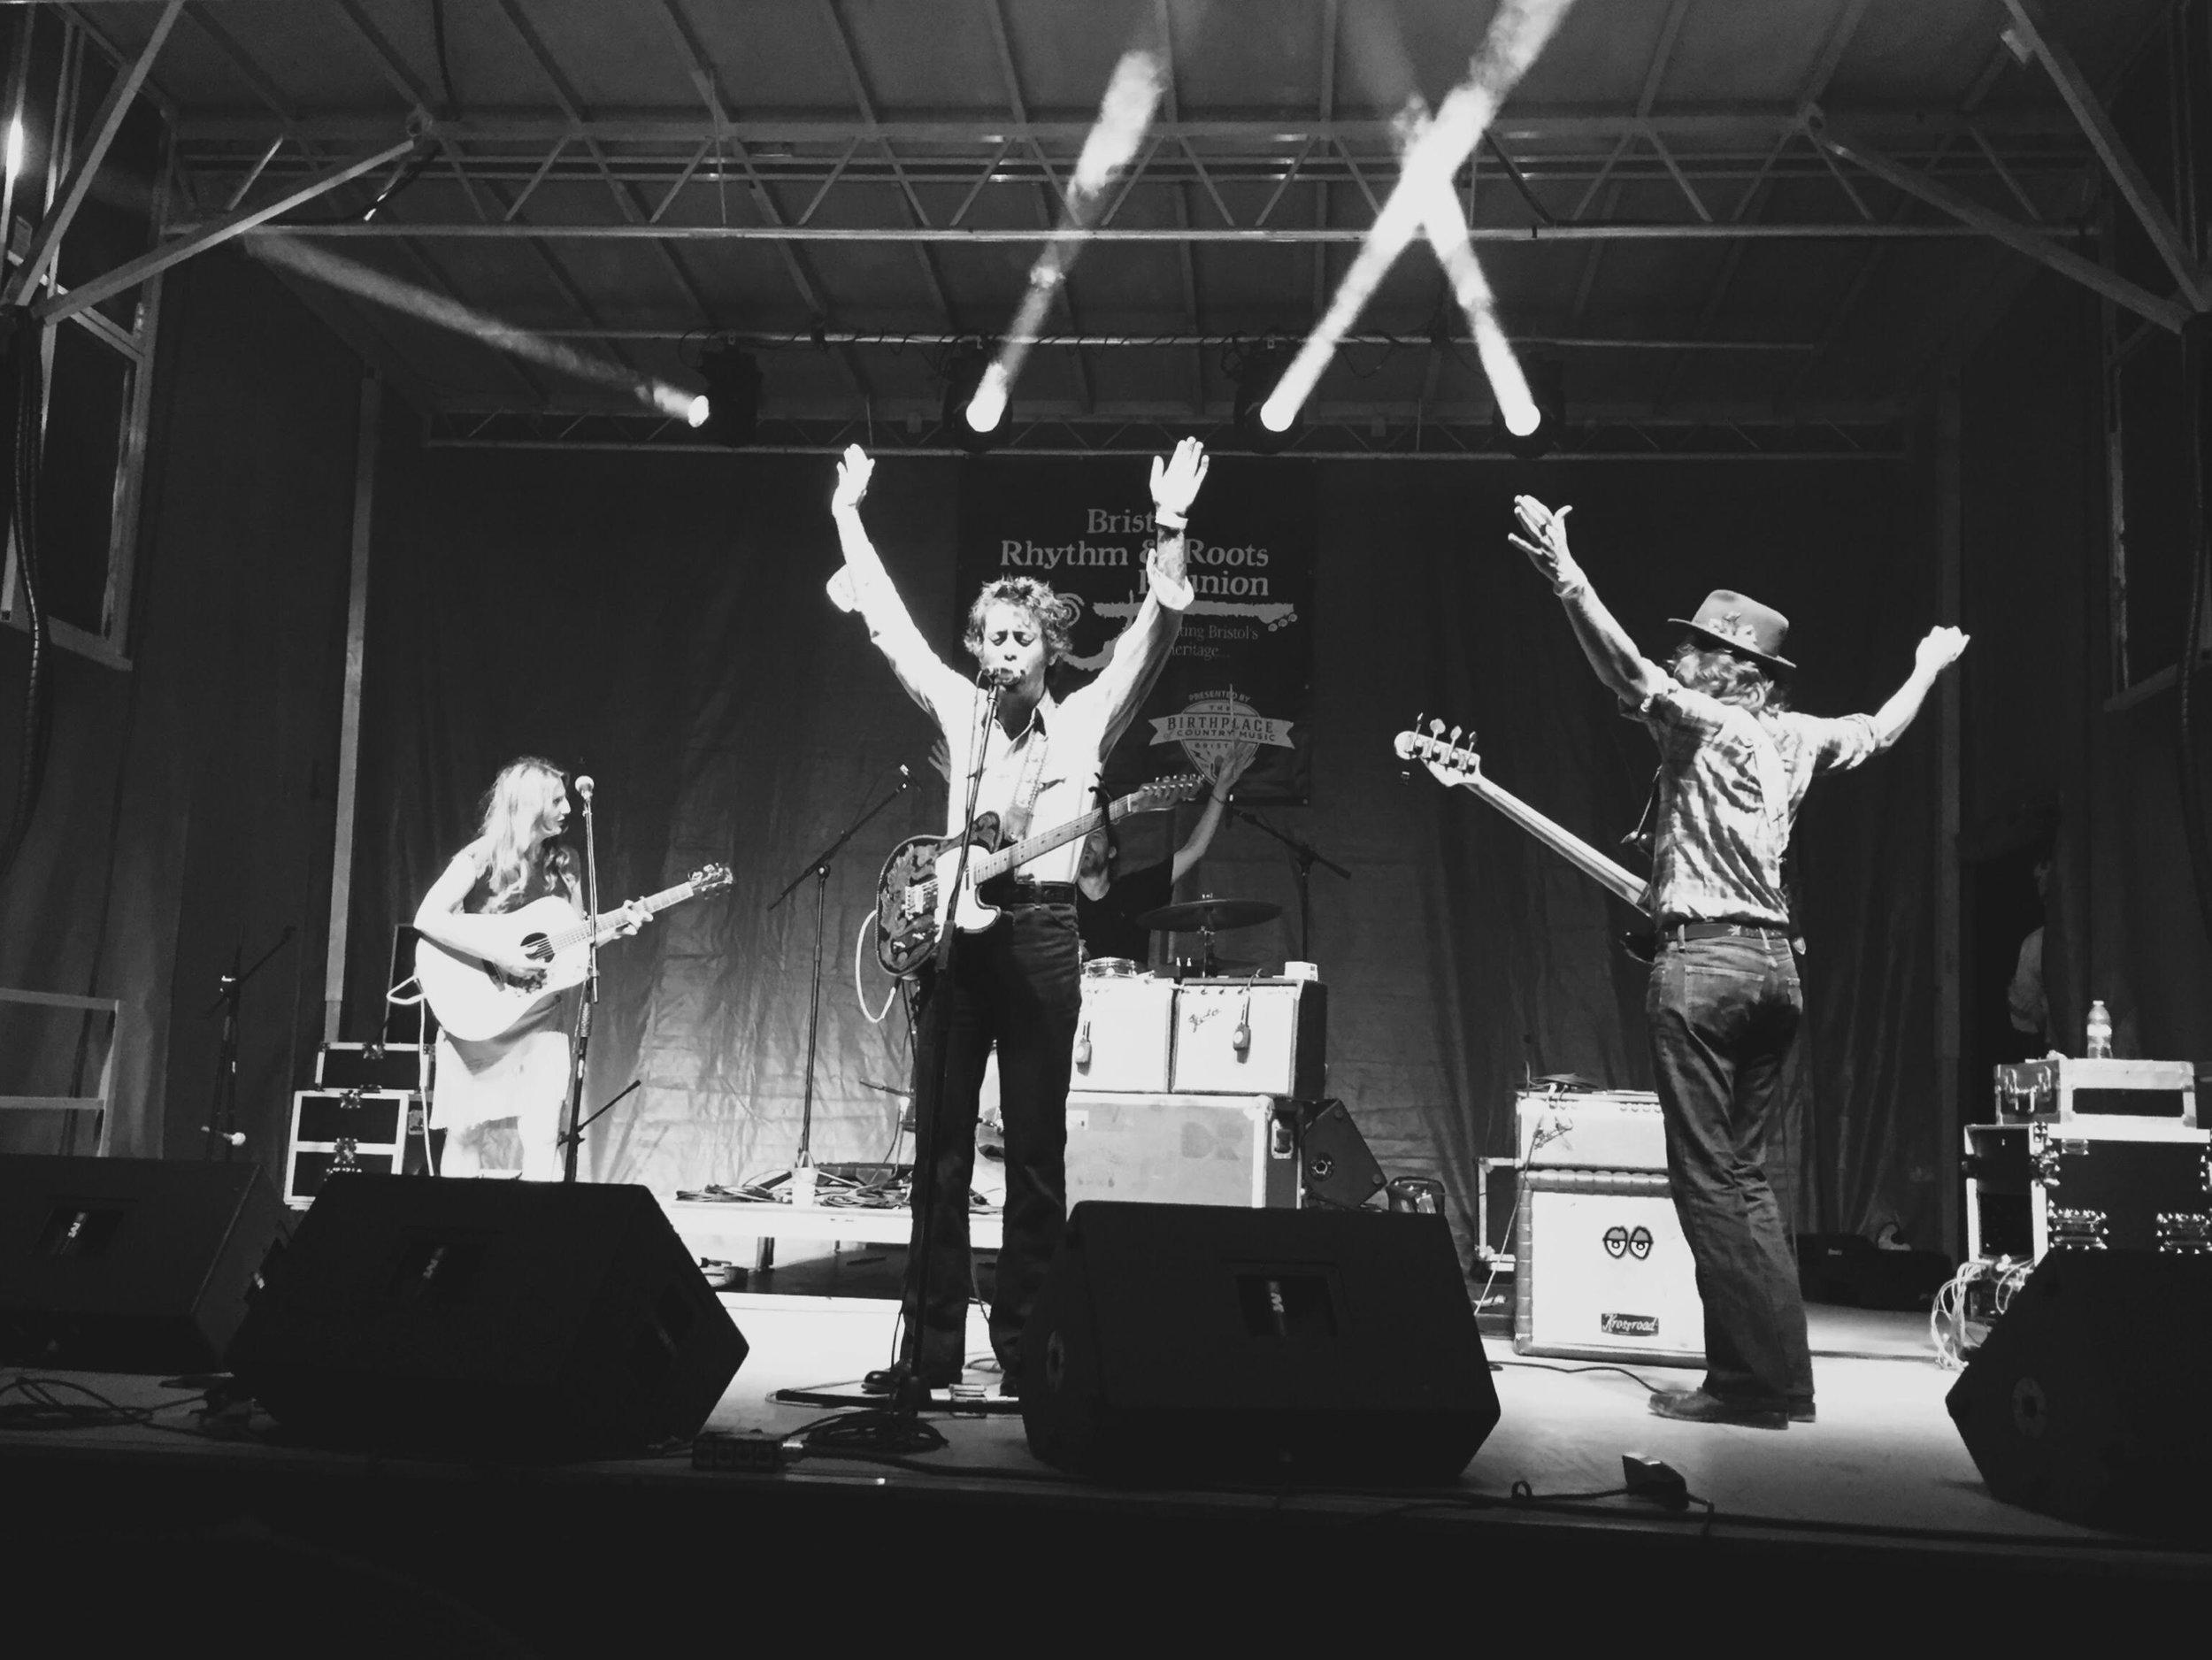 bristol-rhythm-roots-reunion-tennessee-virginia-daniel-romano-birthplace-country-music